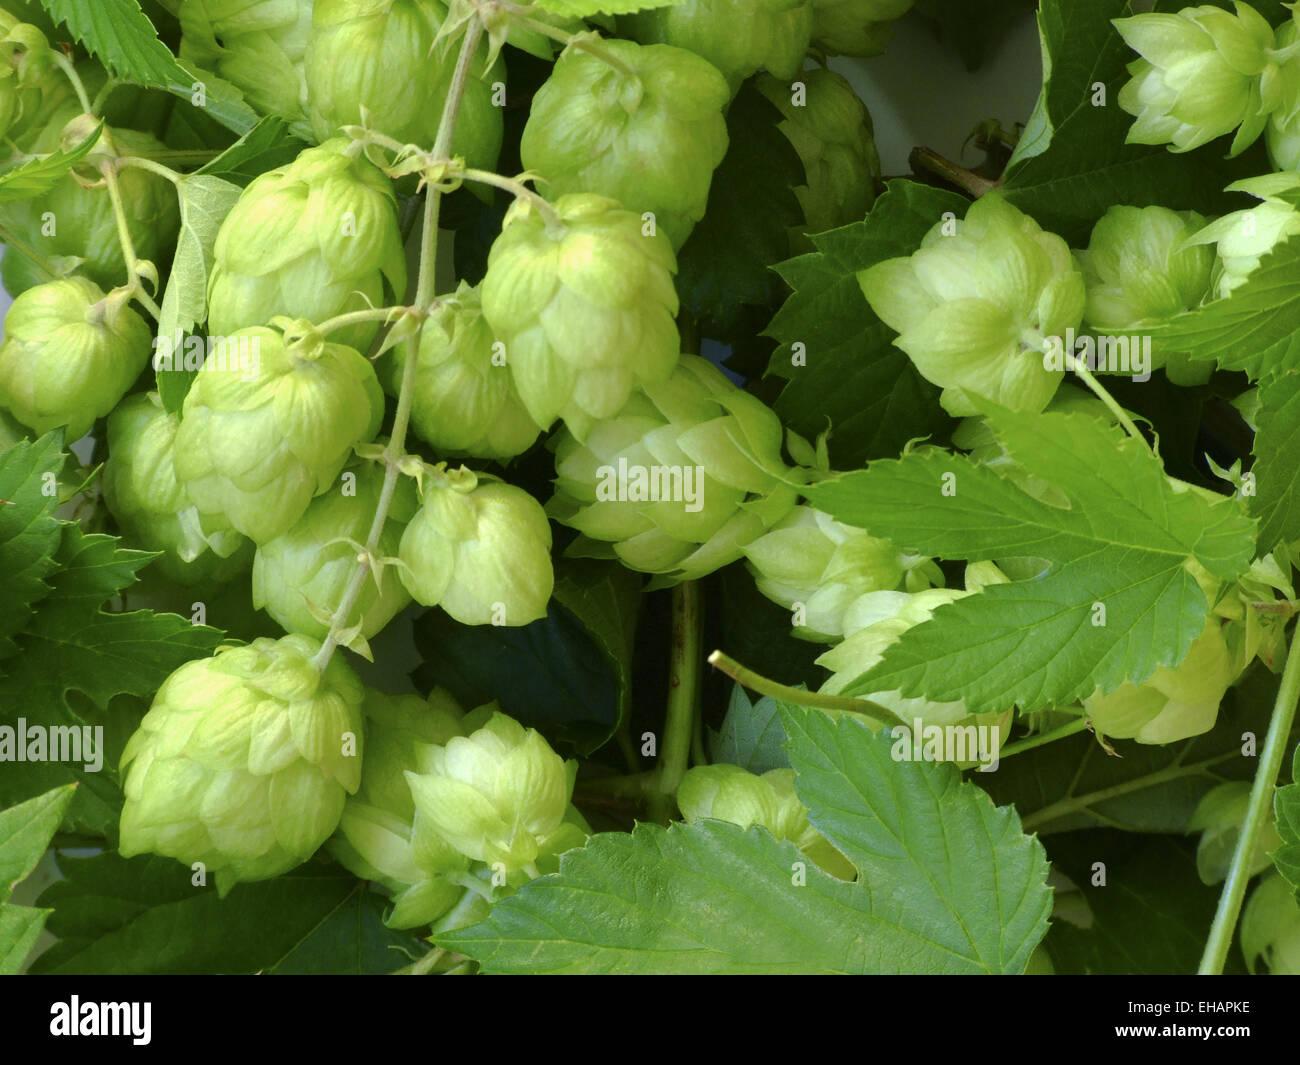 Hopfen / common hops (Humulus Lupulus) - Stock Image